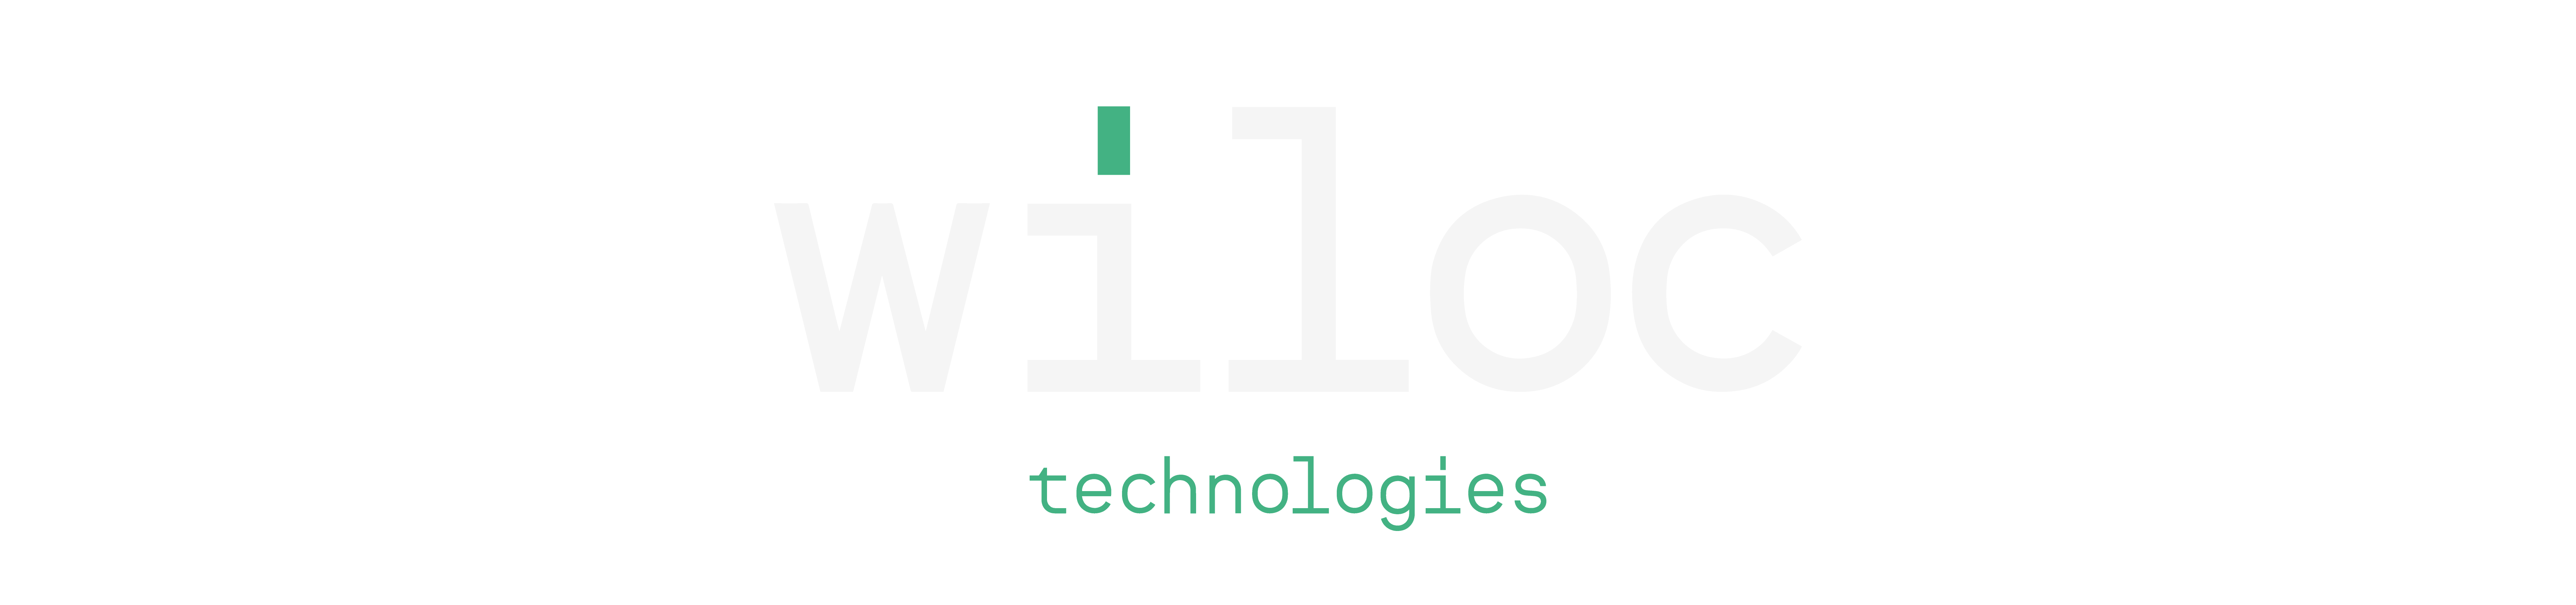 wiloc technologies